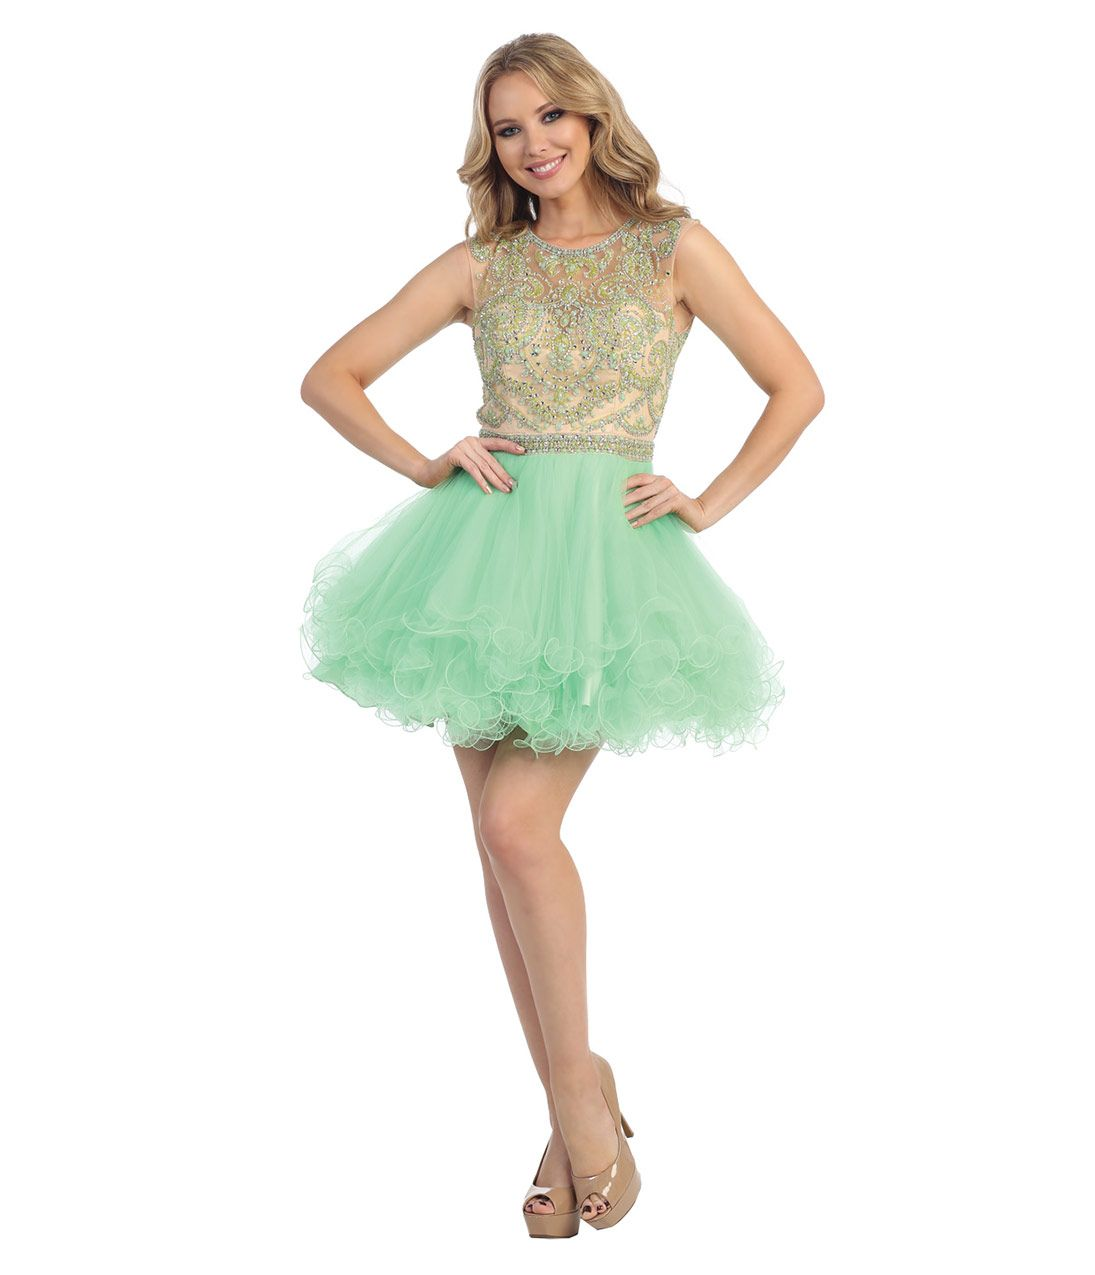 Green dress prom  Mint Green u Nude Sheer Beaded Short Dress for Prom   Mint